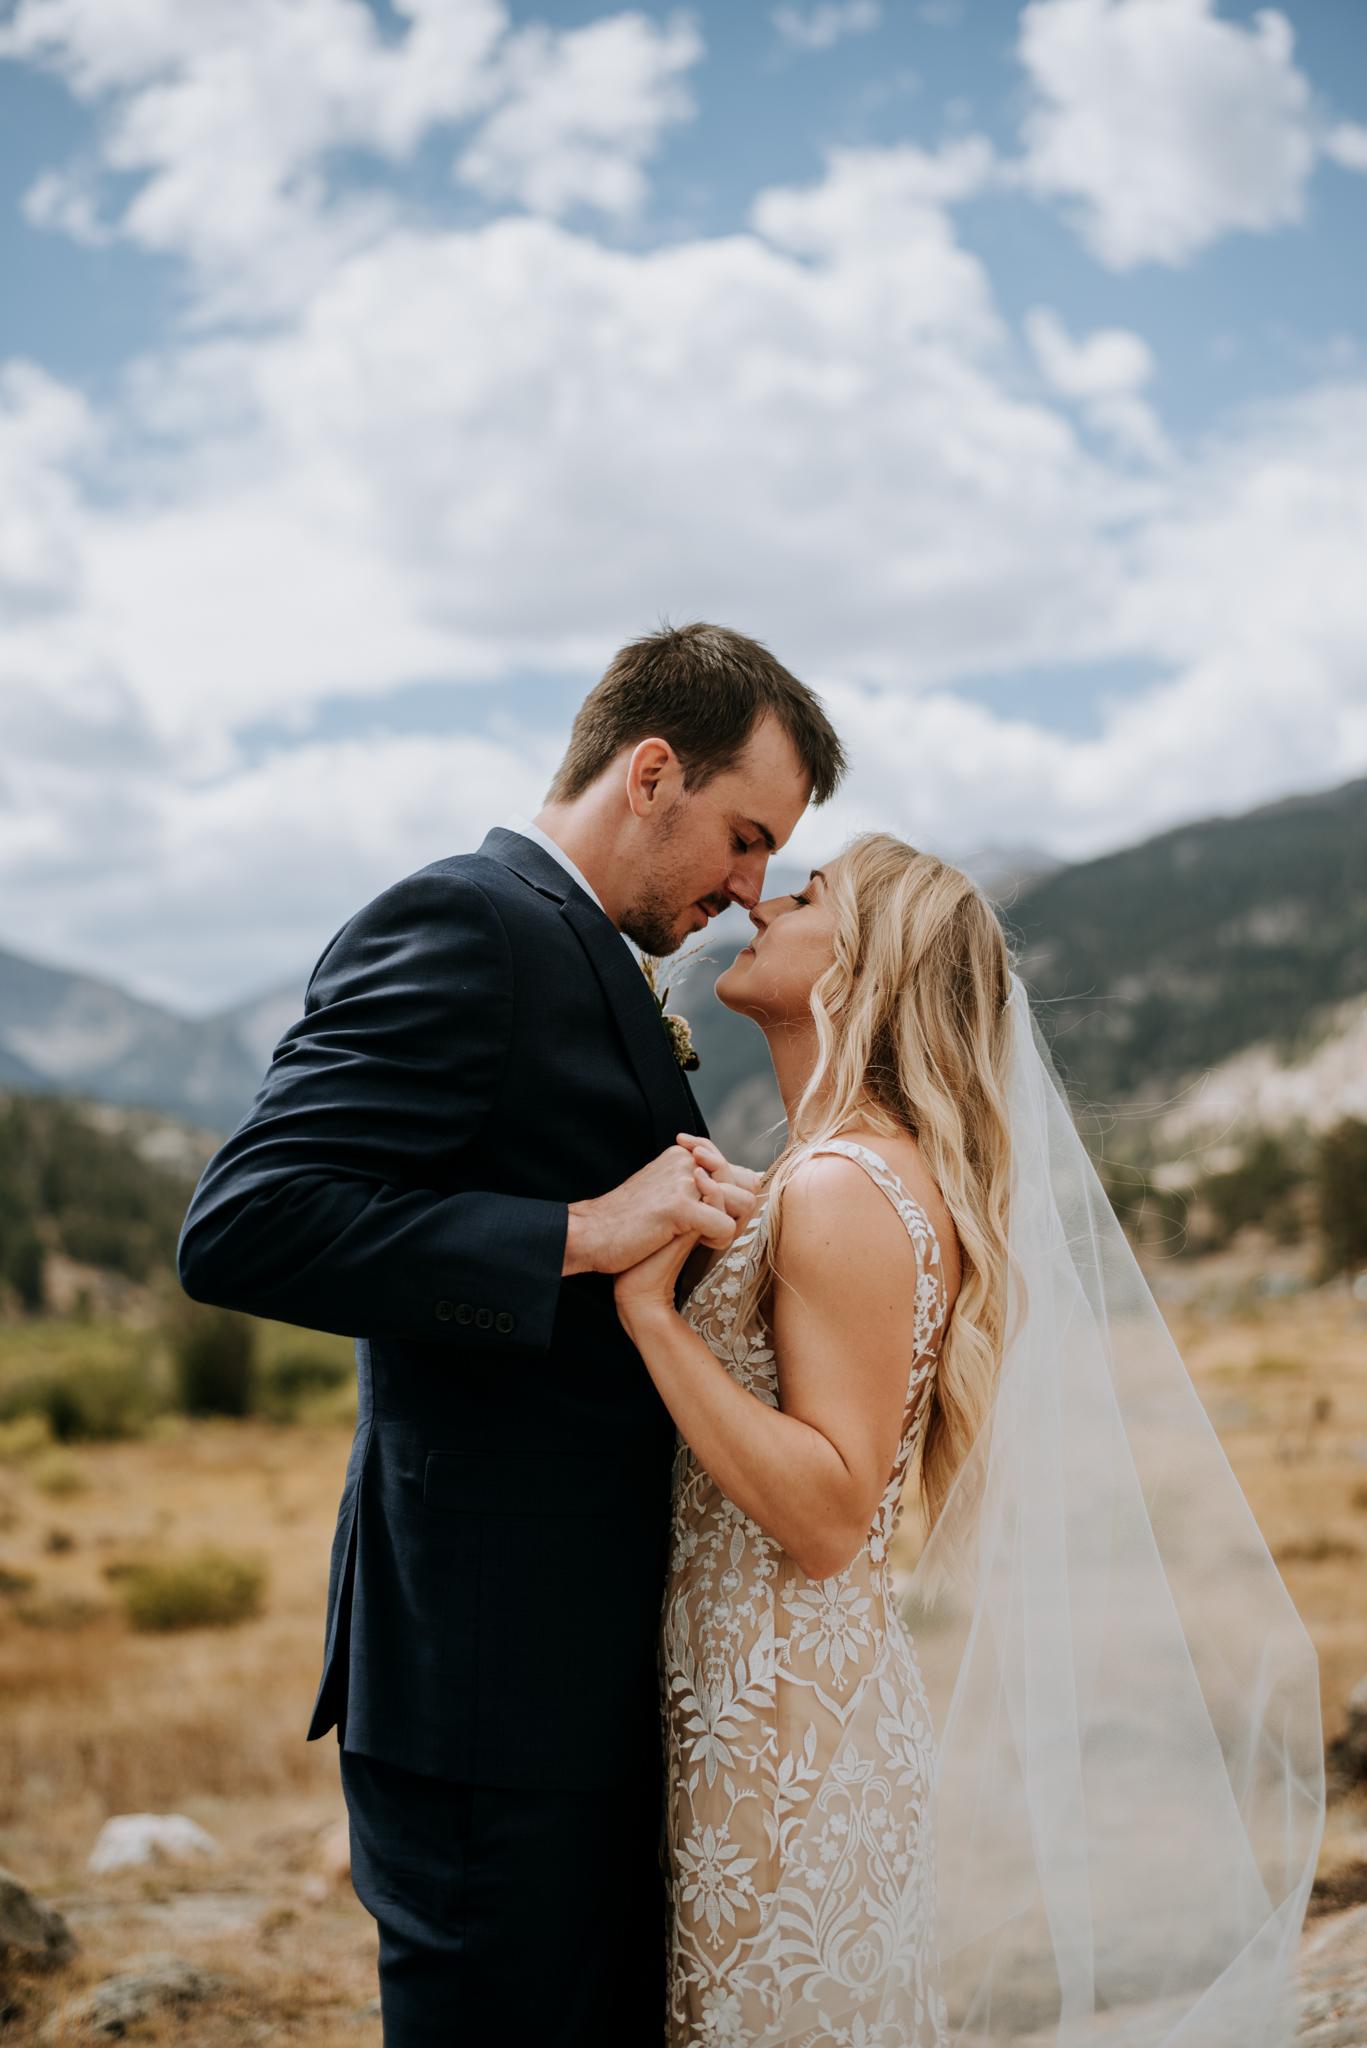 Check out this Rocky Mountain National Park Estes Park wedding.